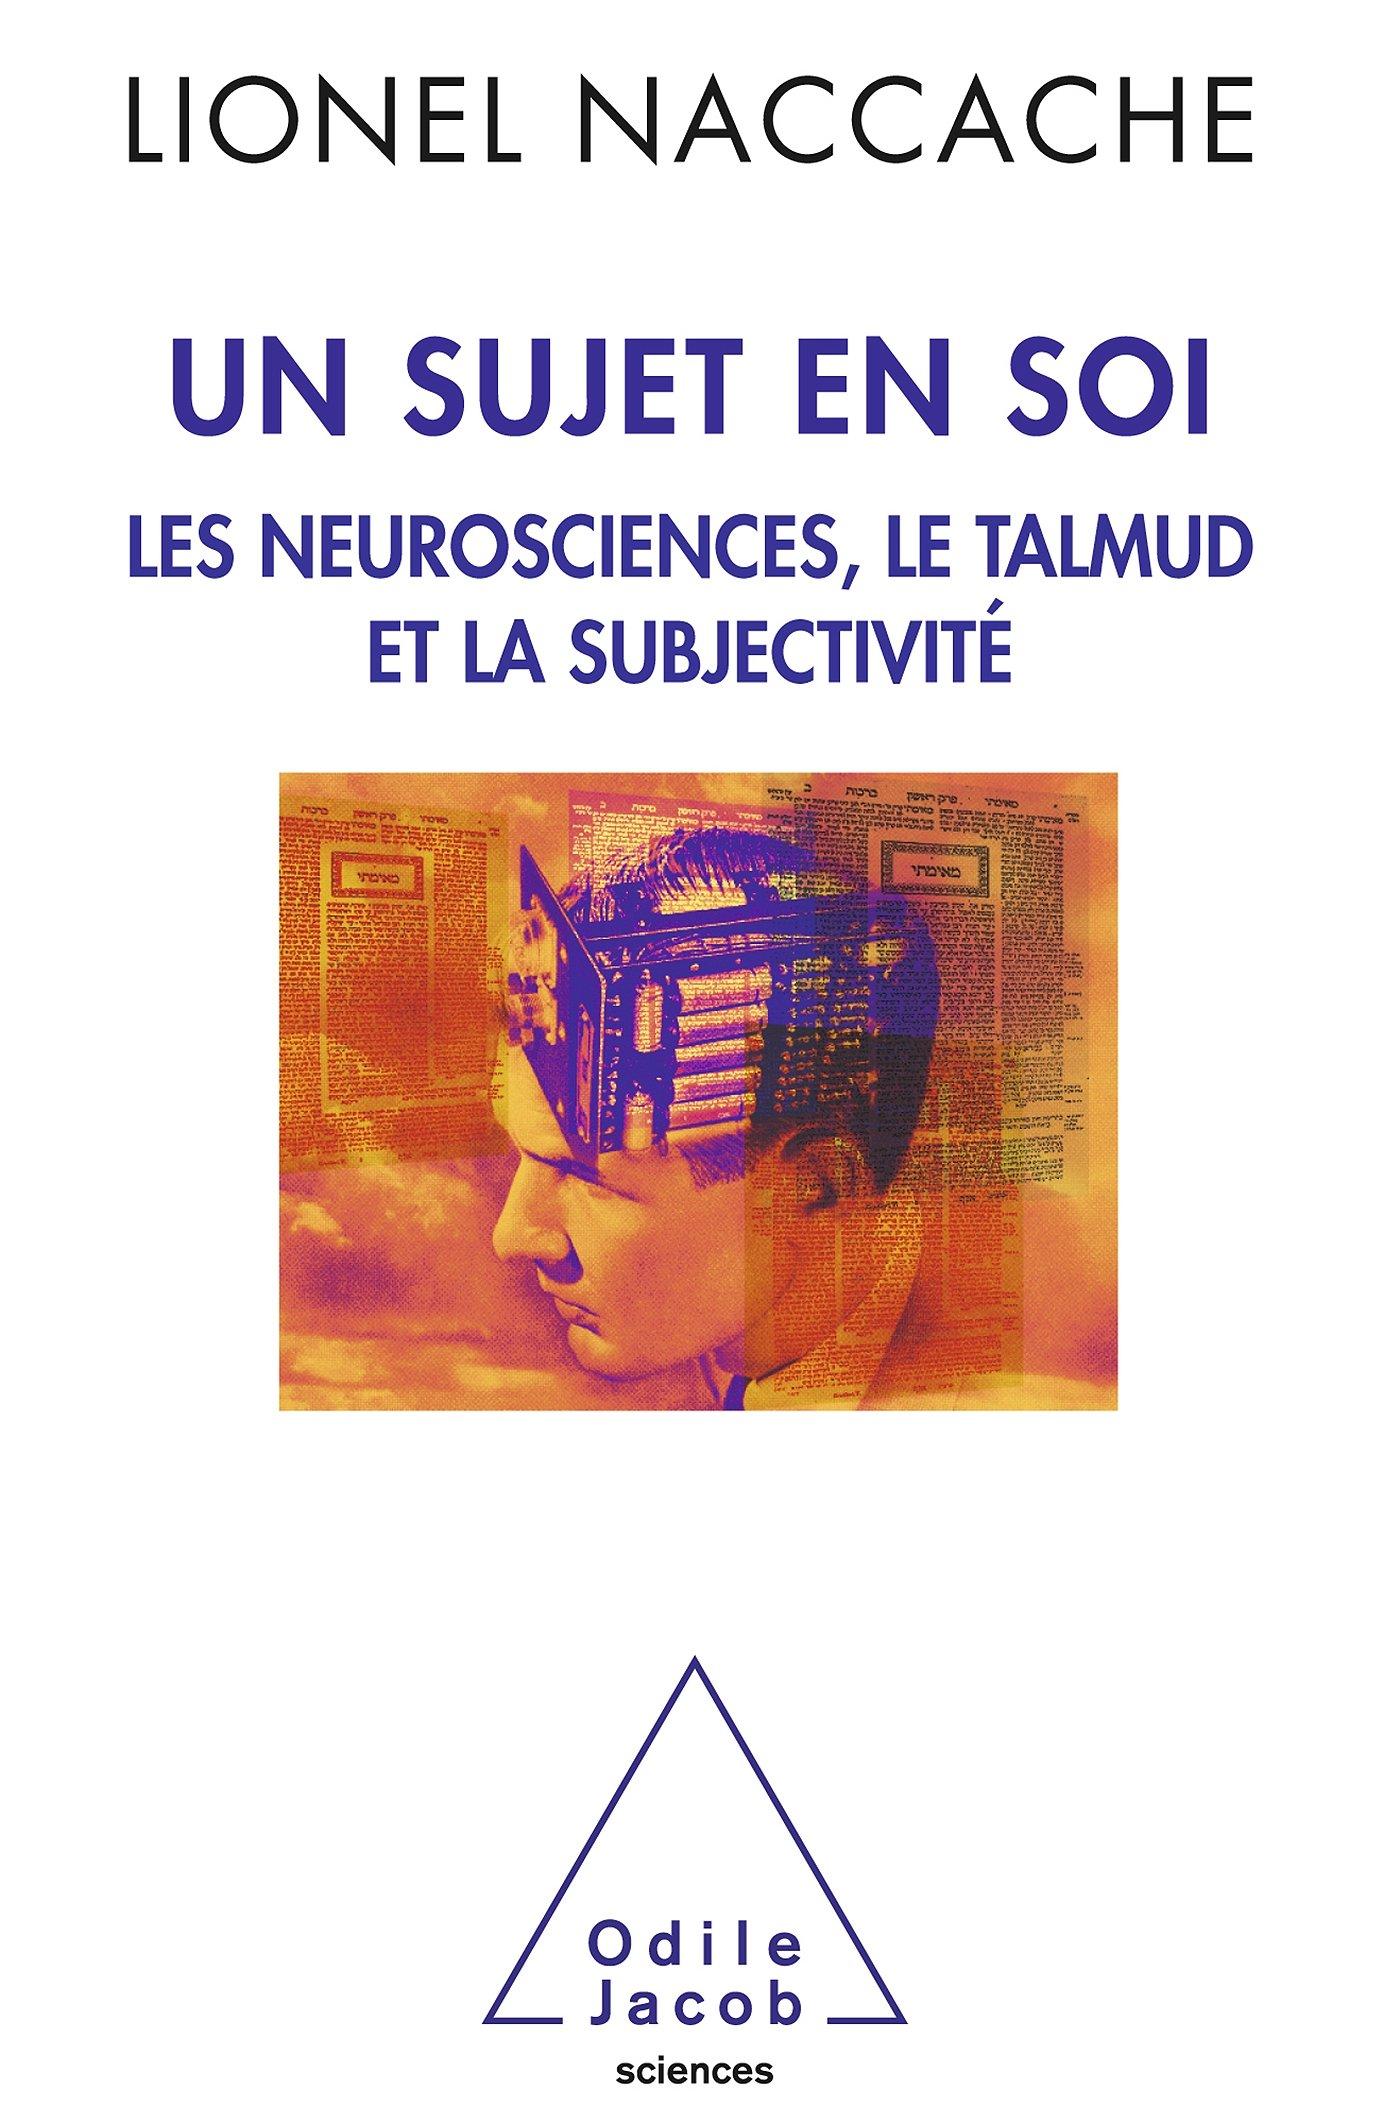 Un sujet en soi: Les neurosciences, le Talmud et la subjectivité OJ.SCIENCES: Amazon.es: Lionel Naccache: Libros en idiomas extranjeros